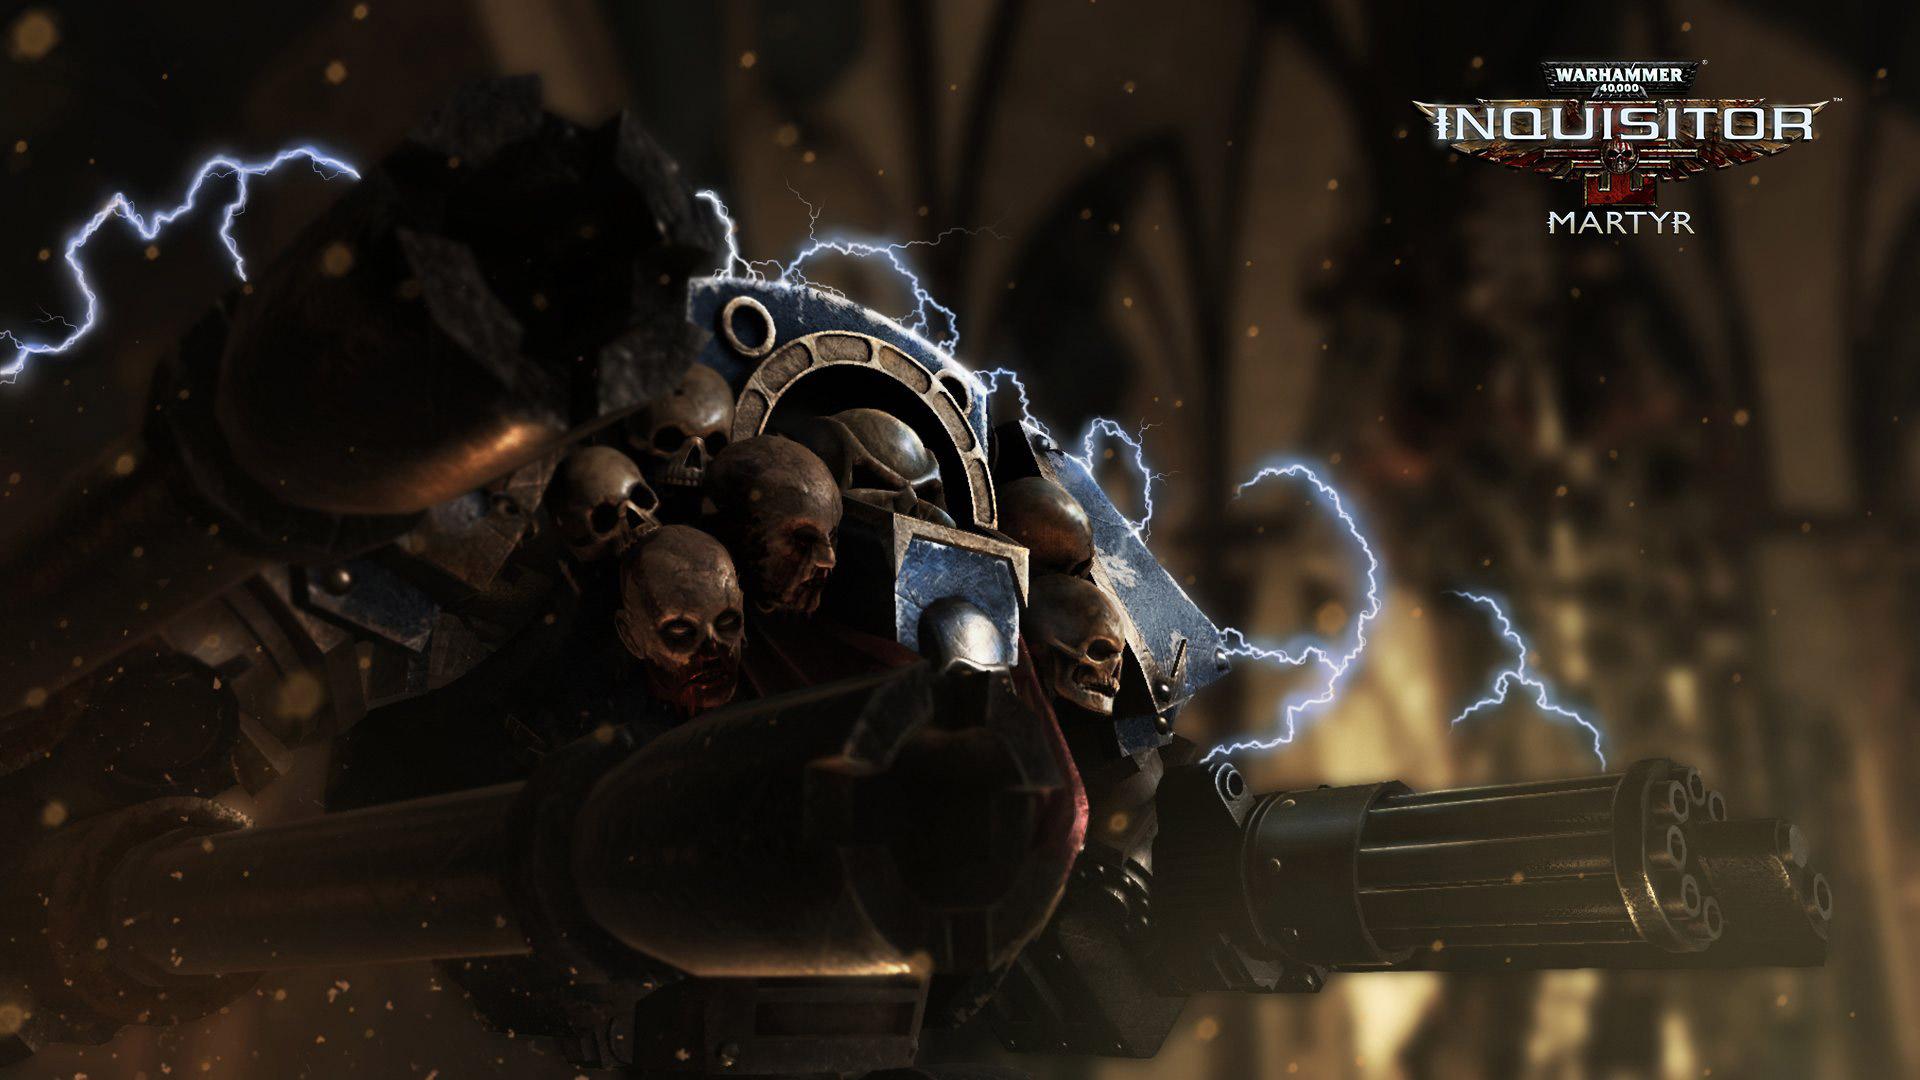 Warhammer 40,000: Inquisitor - Martyr Wallpaper in 1920x1080